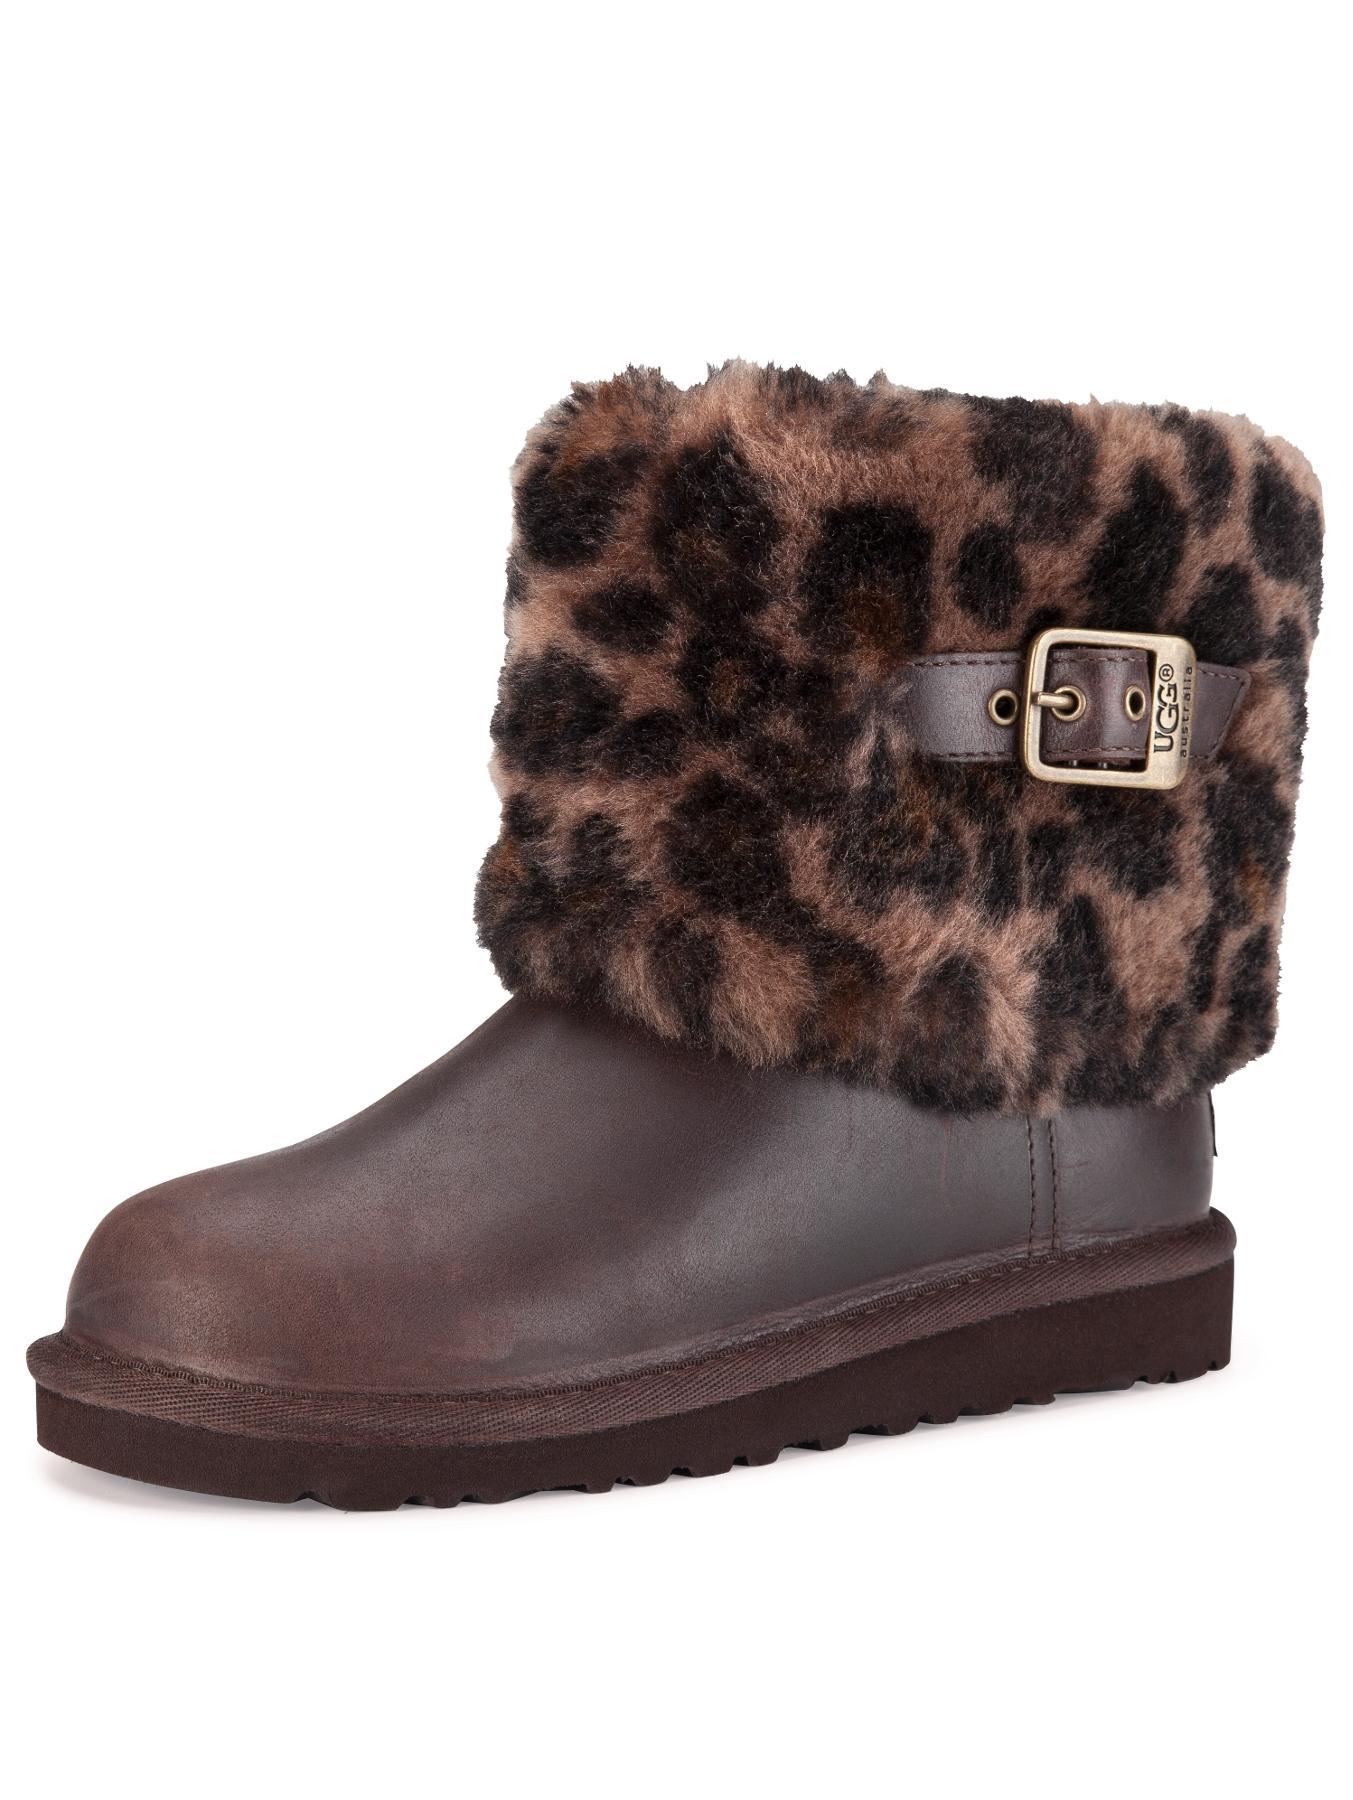 ugg australia ellee fleece collar boots